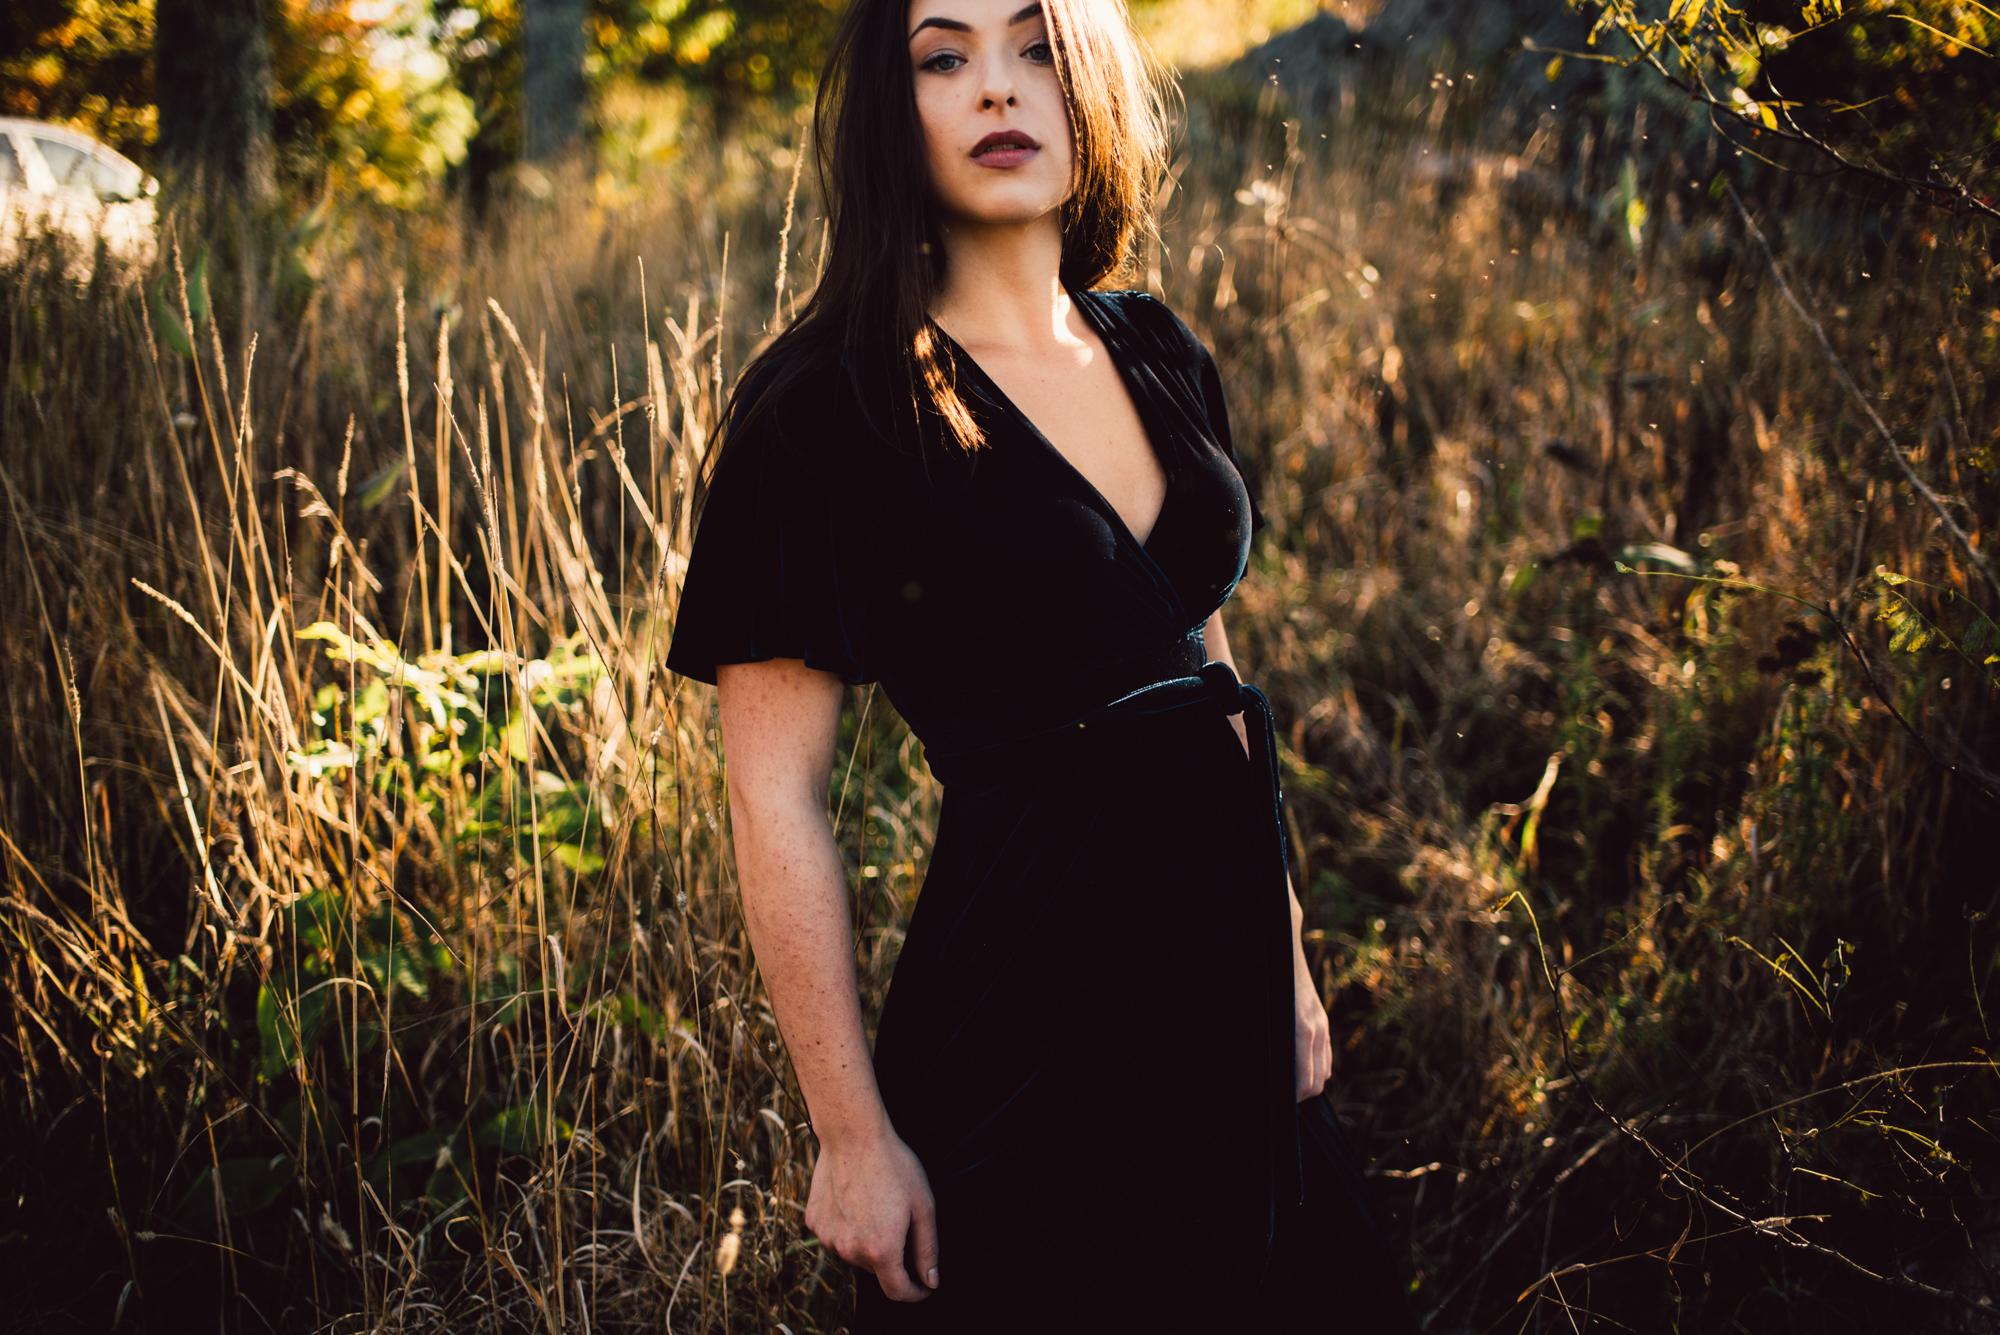 Megan_Shenandoah_National_Park_Windy_Romantic_Portraits_9.JPG